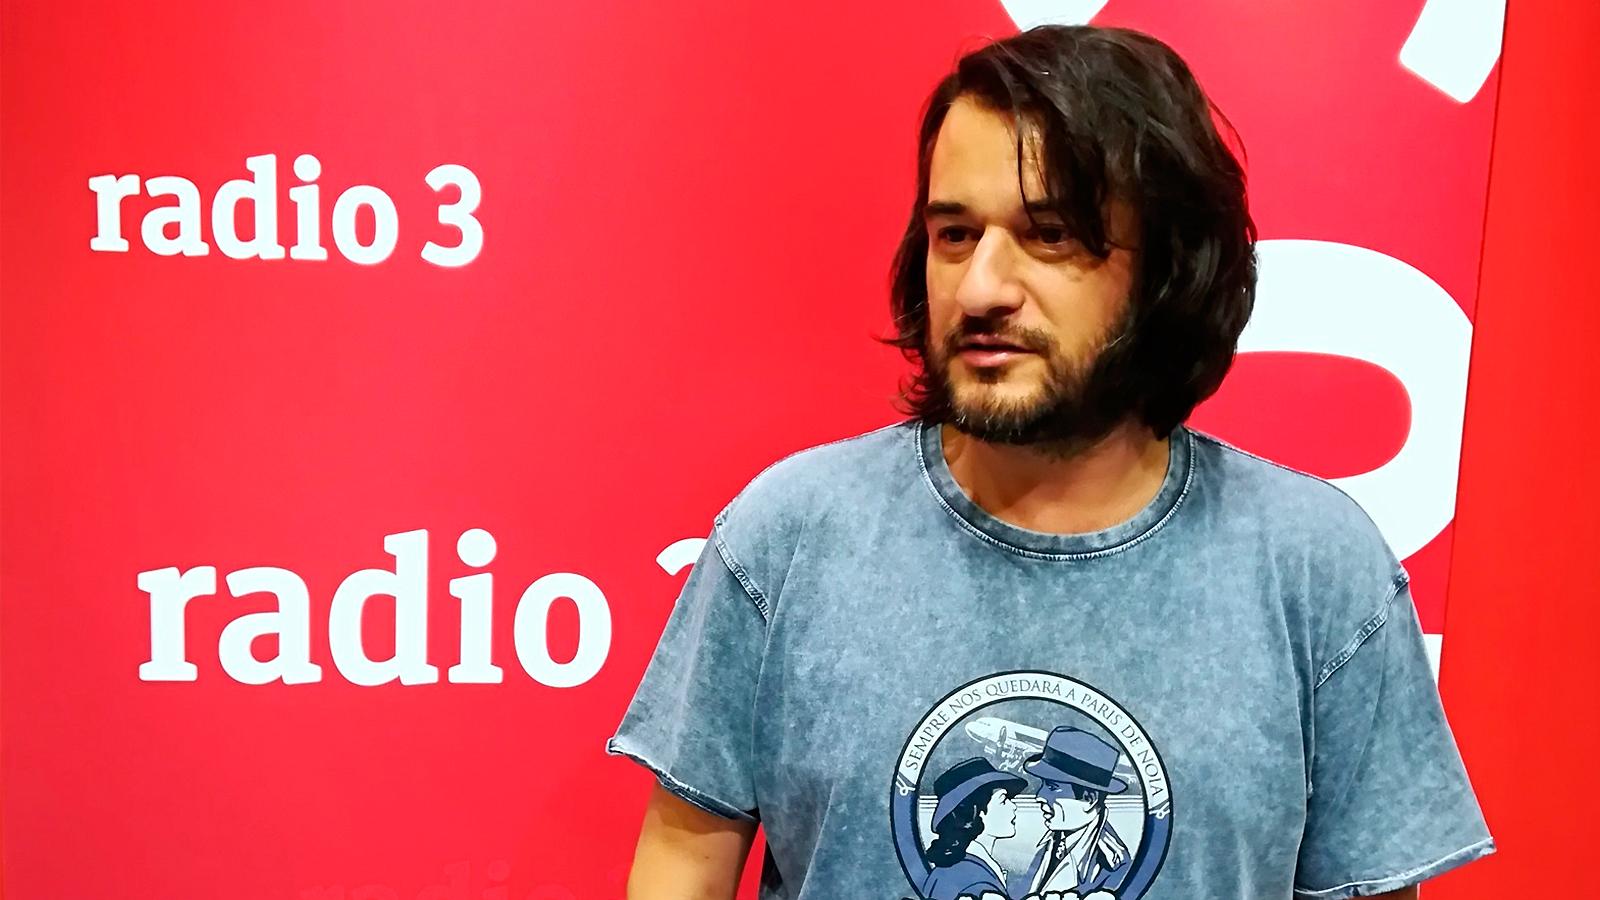 Efecto Doppler - 'Malaherba' con Manuel Jabois - 22/05/19 - RTVE.es